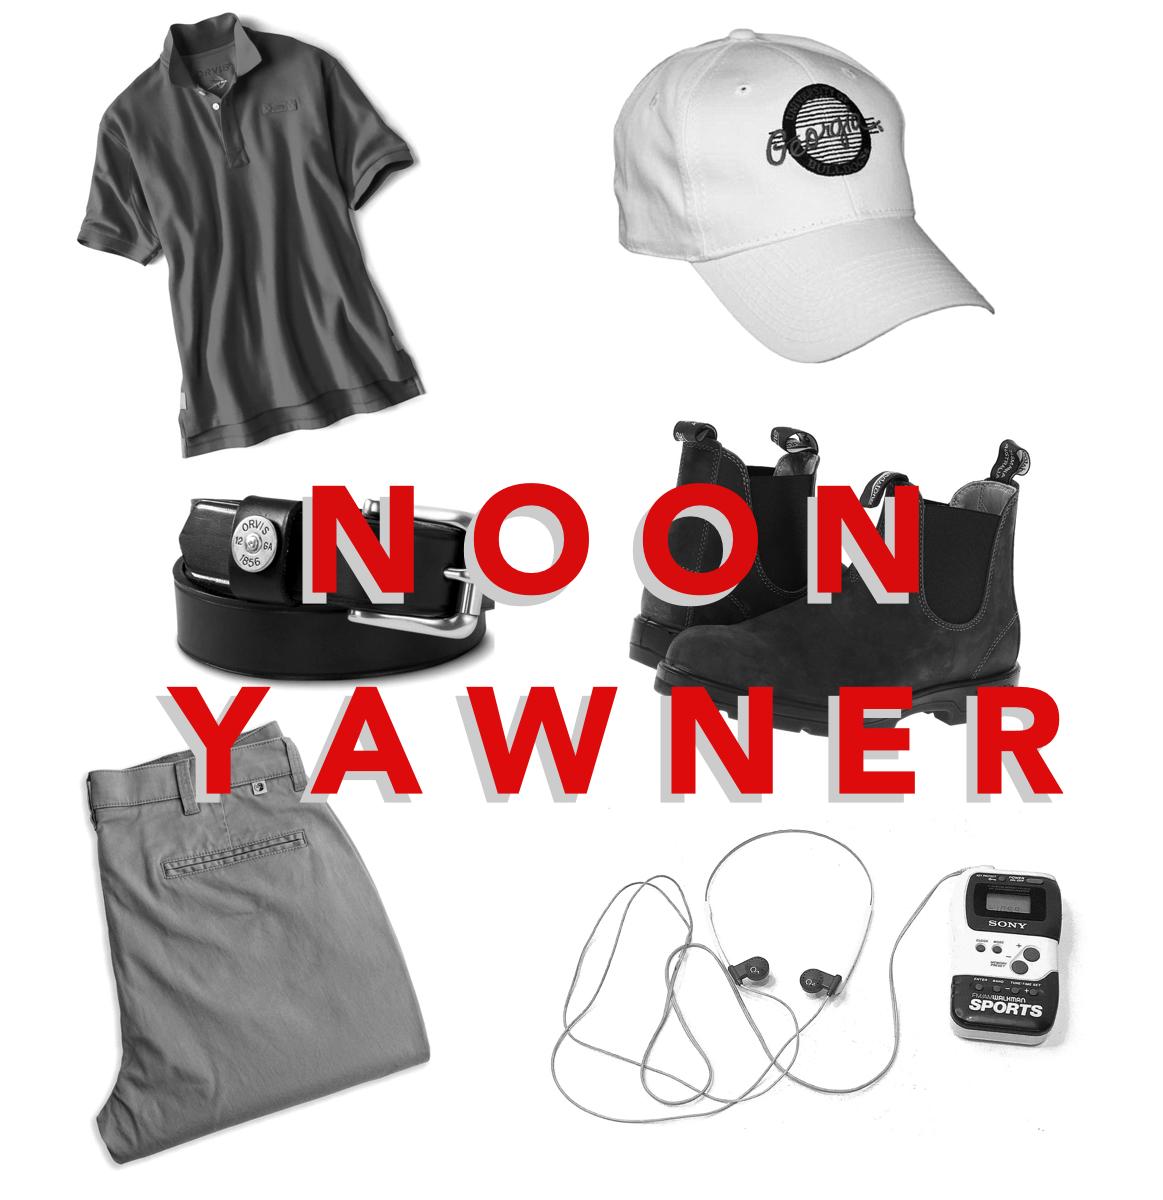 The Noon Yawner